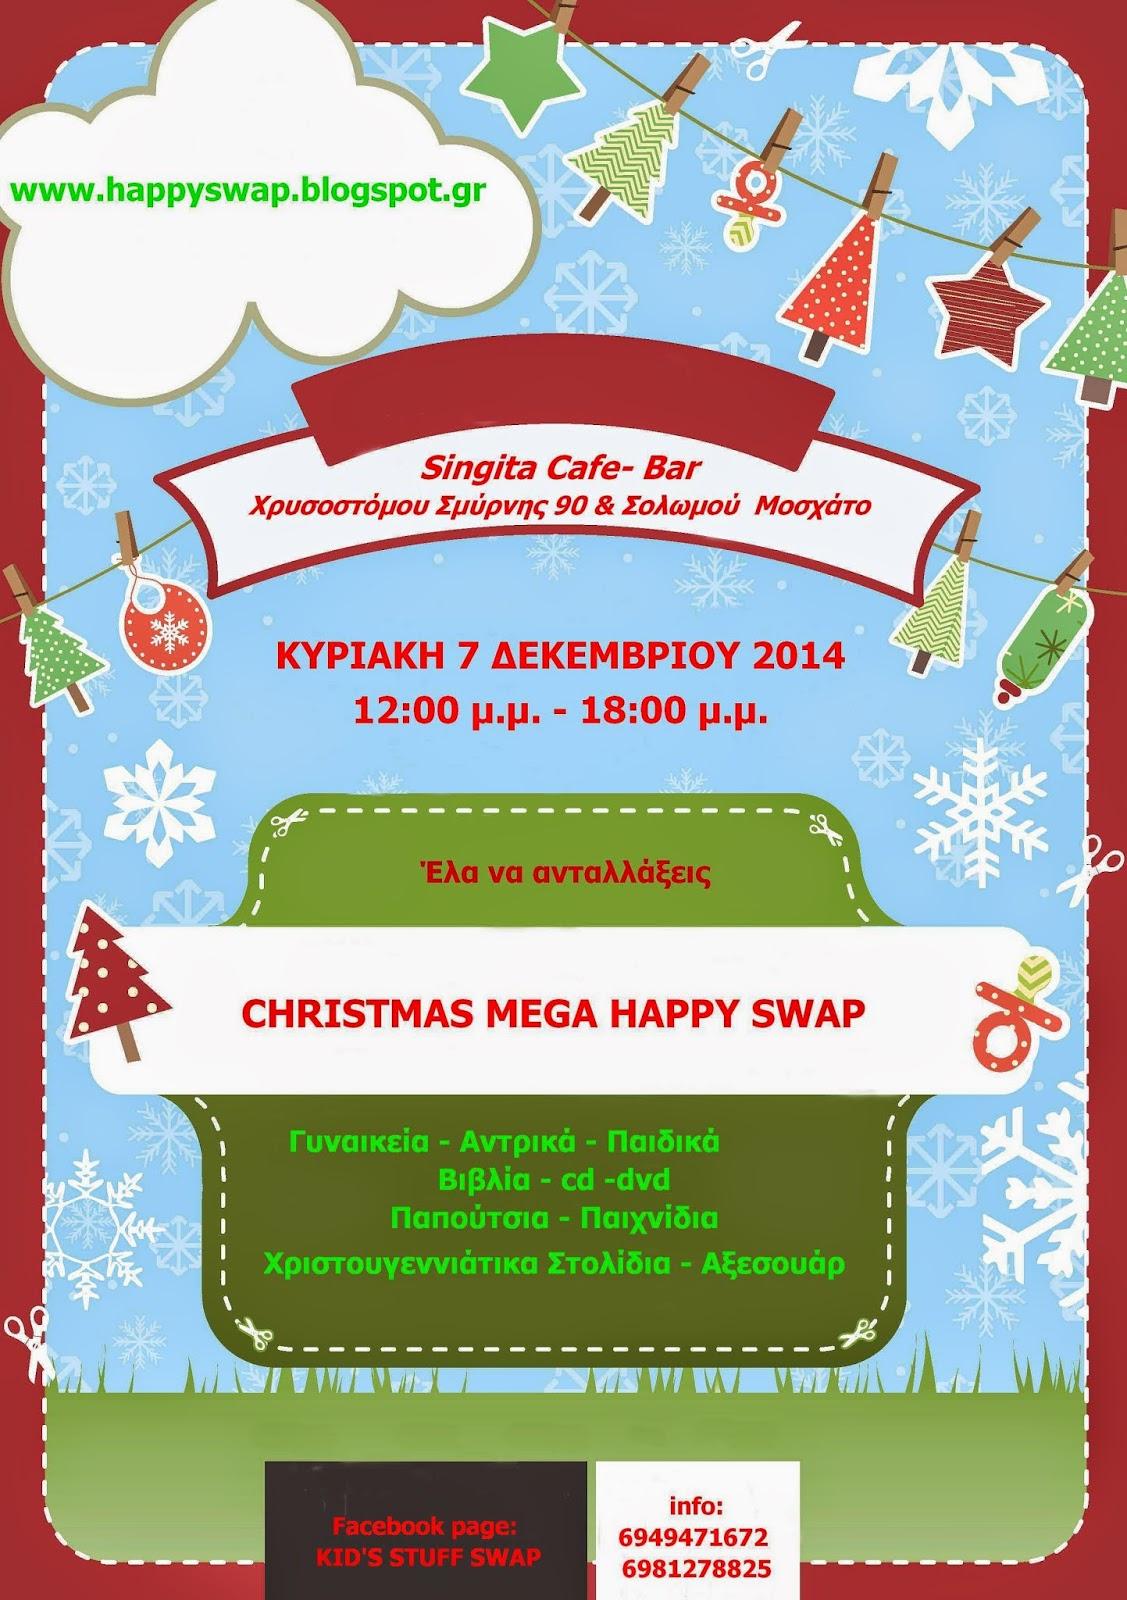 dafbfd8e51b1 Christmas Mega Happy Swap 7 Δεκεμβρίου 2014